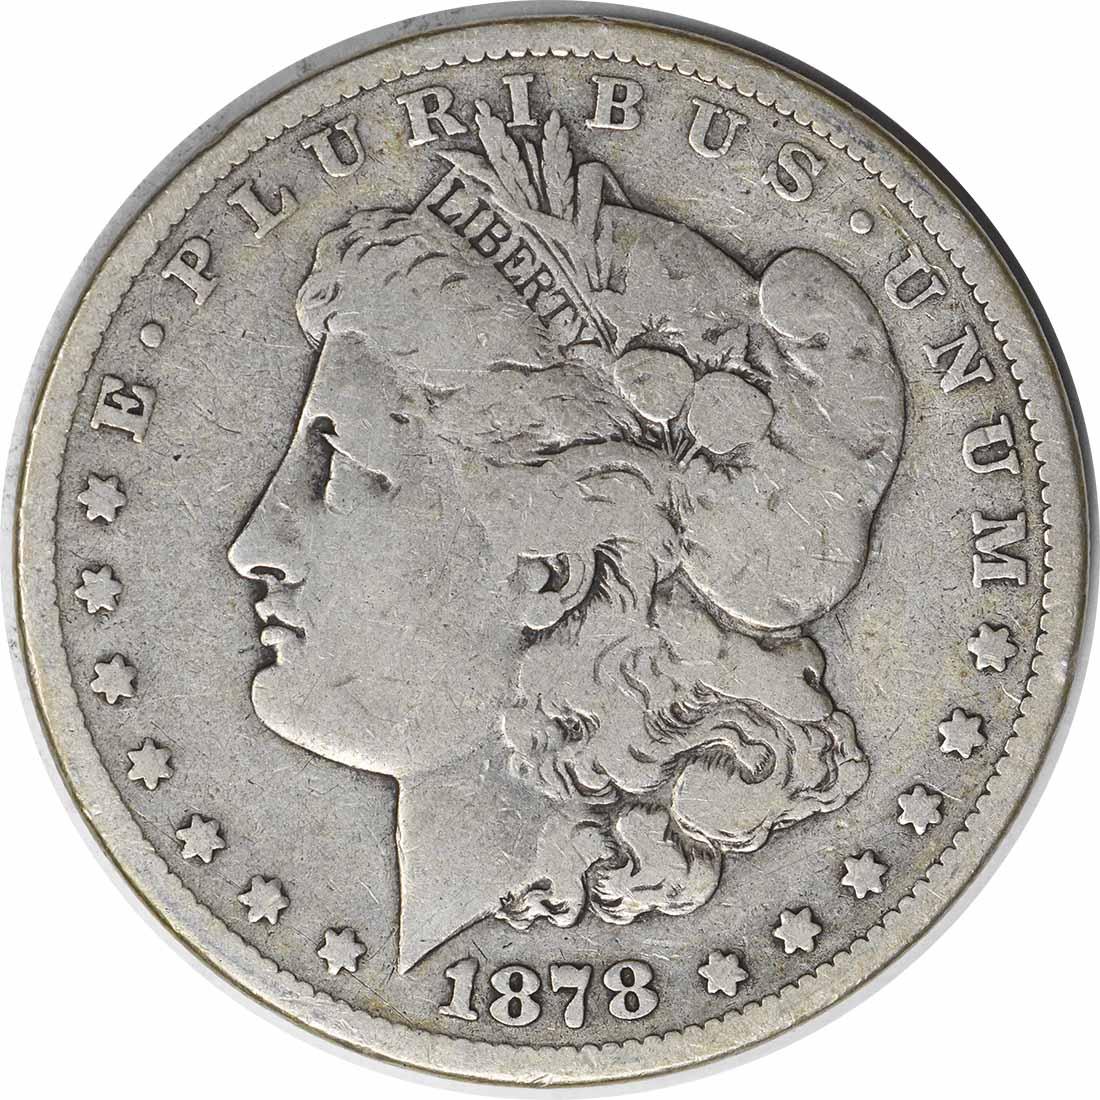 1878-CC Morgan Silver Dollar VG Uncertified #1139